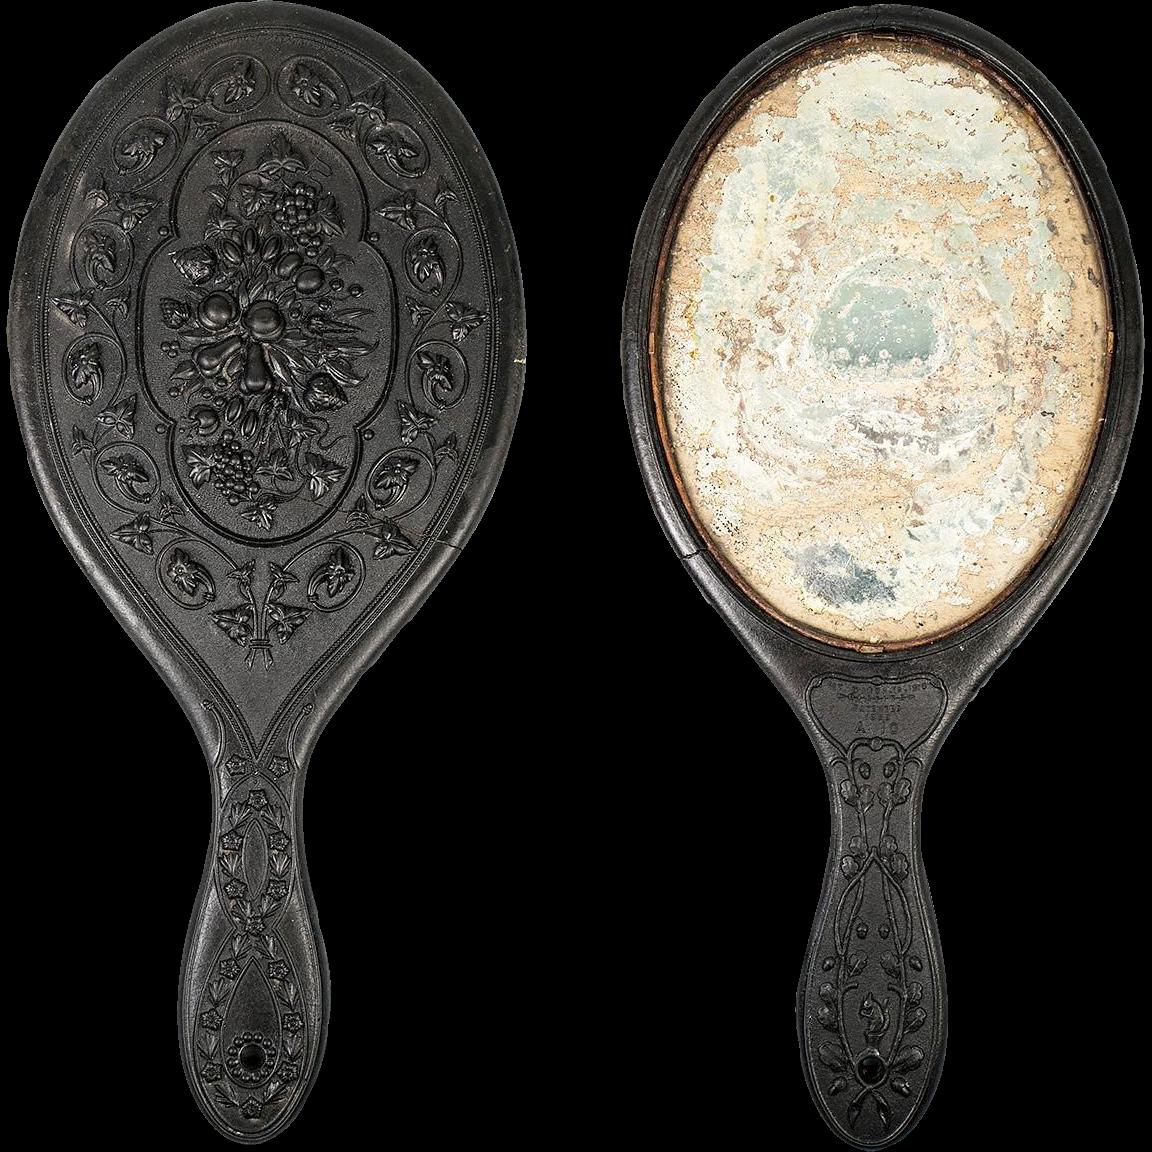 1860s Gutta Percha Vanity/Hand Mirror, Lovely Bas Relief Sculpture Effect